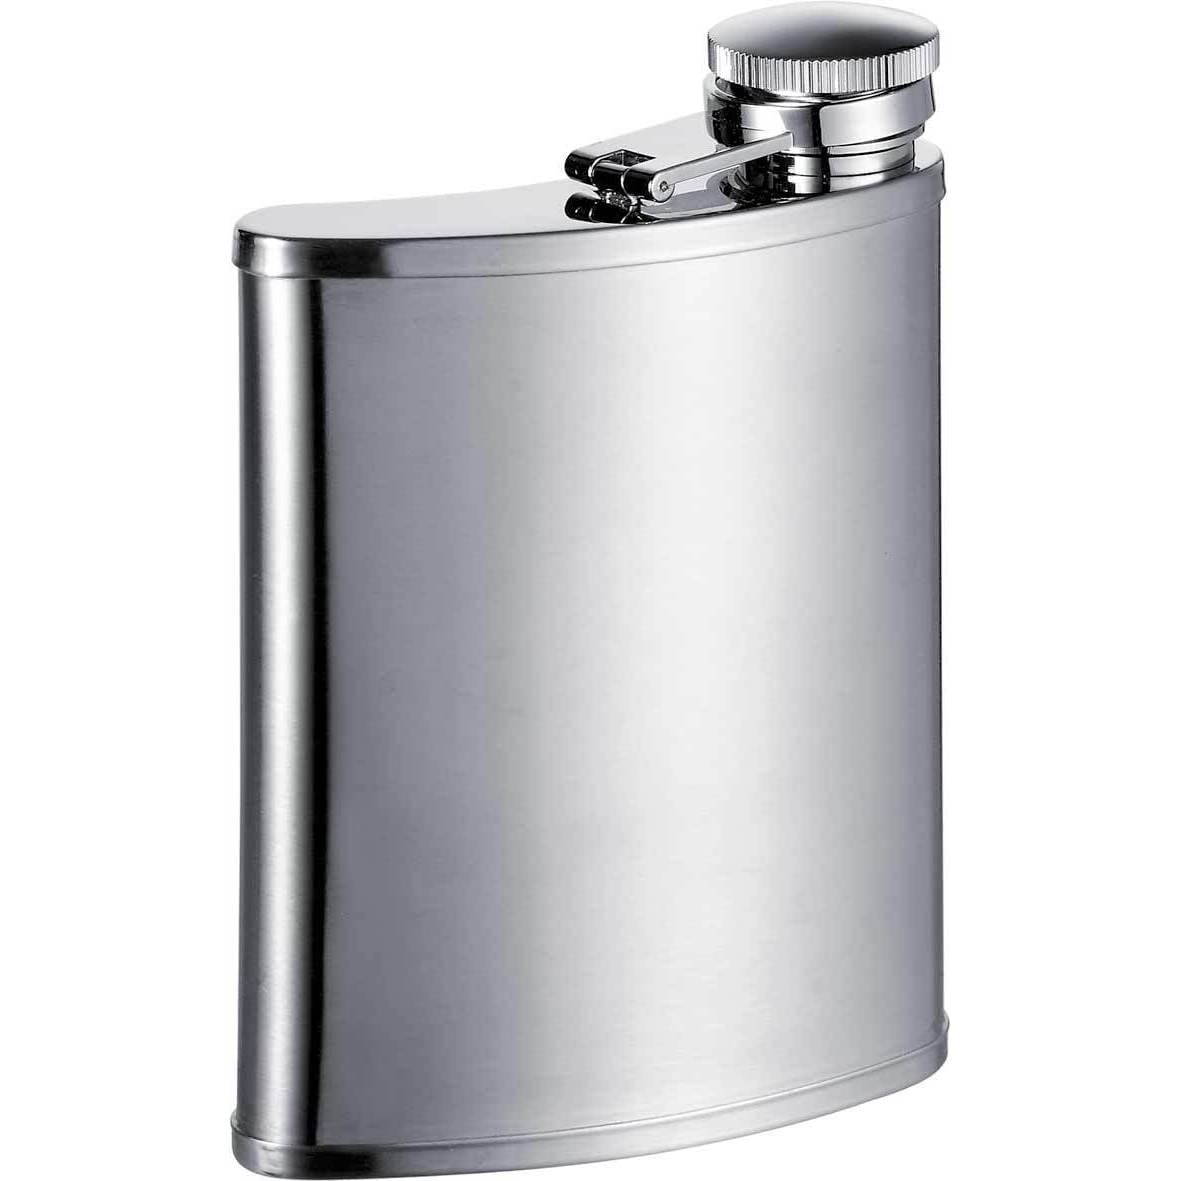 Visol Bass Wide Mouth Satin Liquor Flask - 7 ounces (Silv...